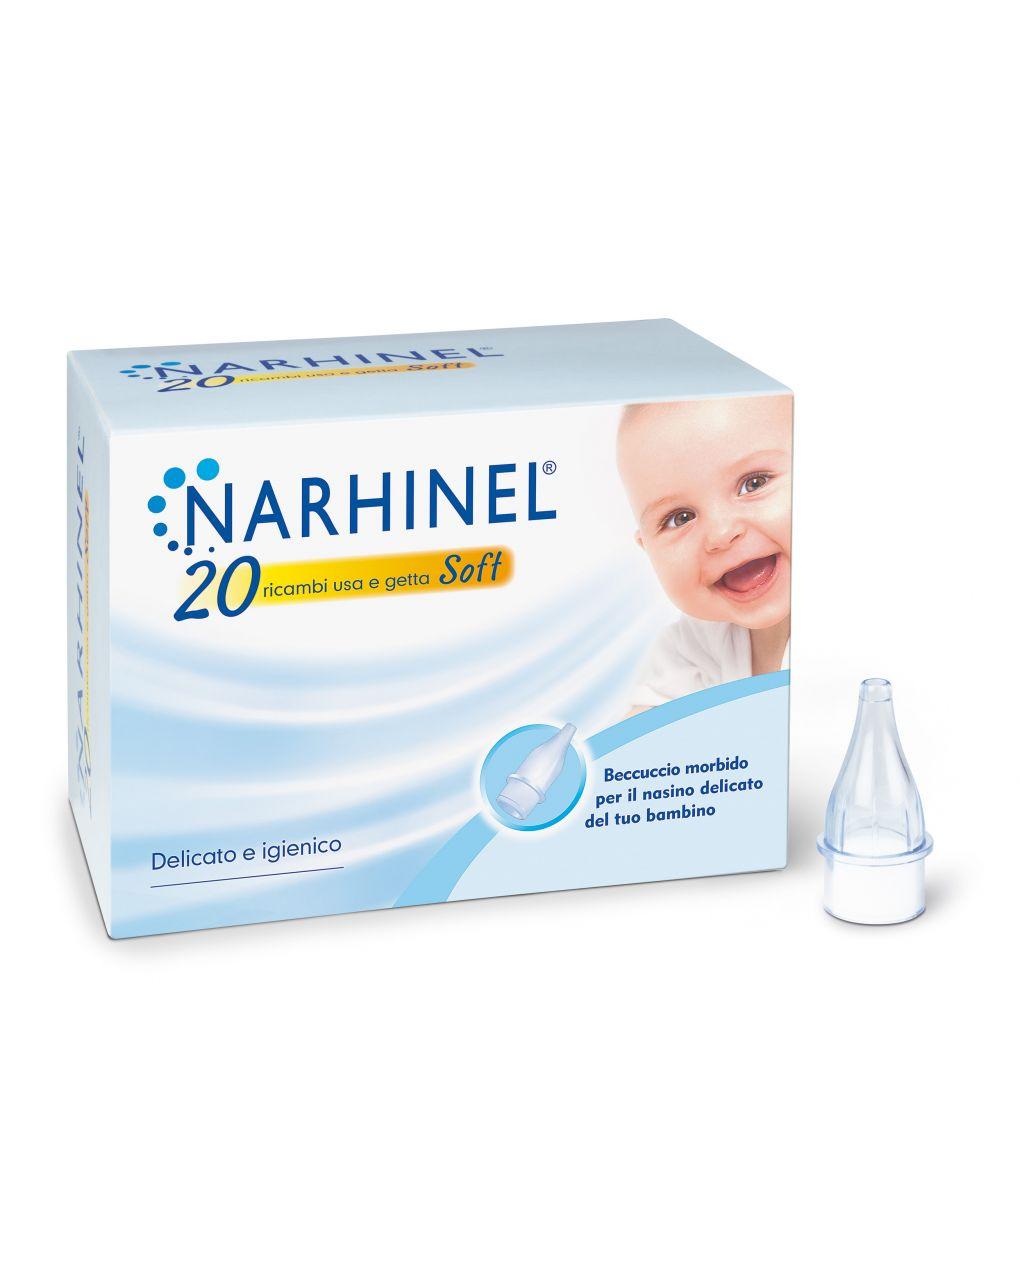 Narhinel 20 ricambi soft - Narhinel